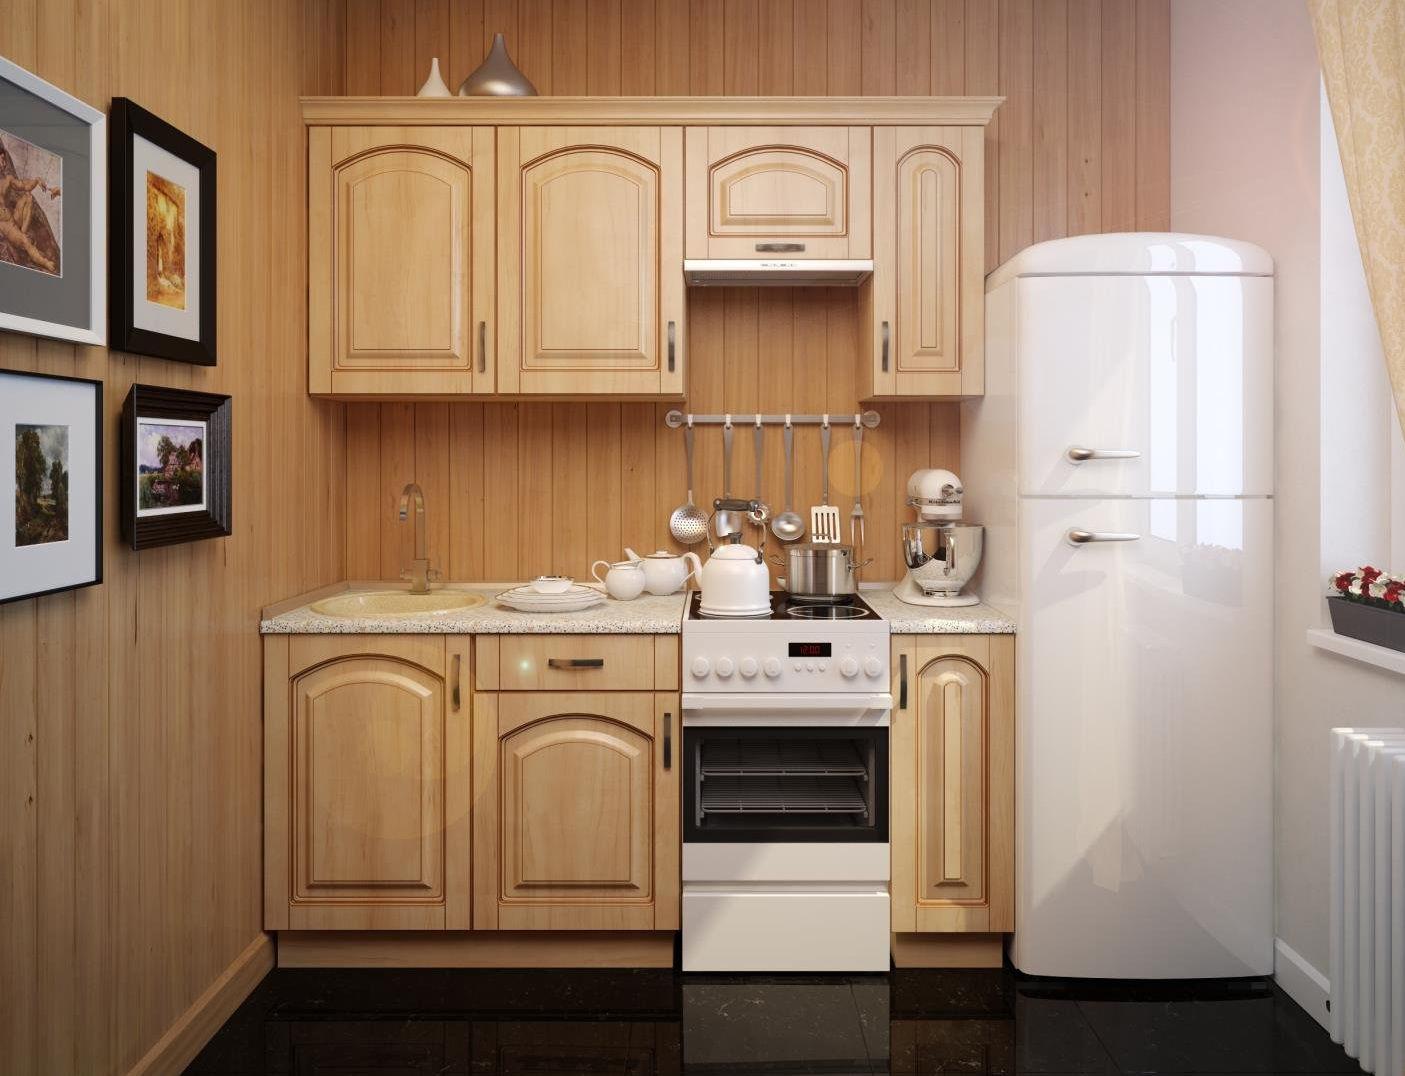 Холодильник на кухне 6 м.кв.